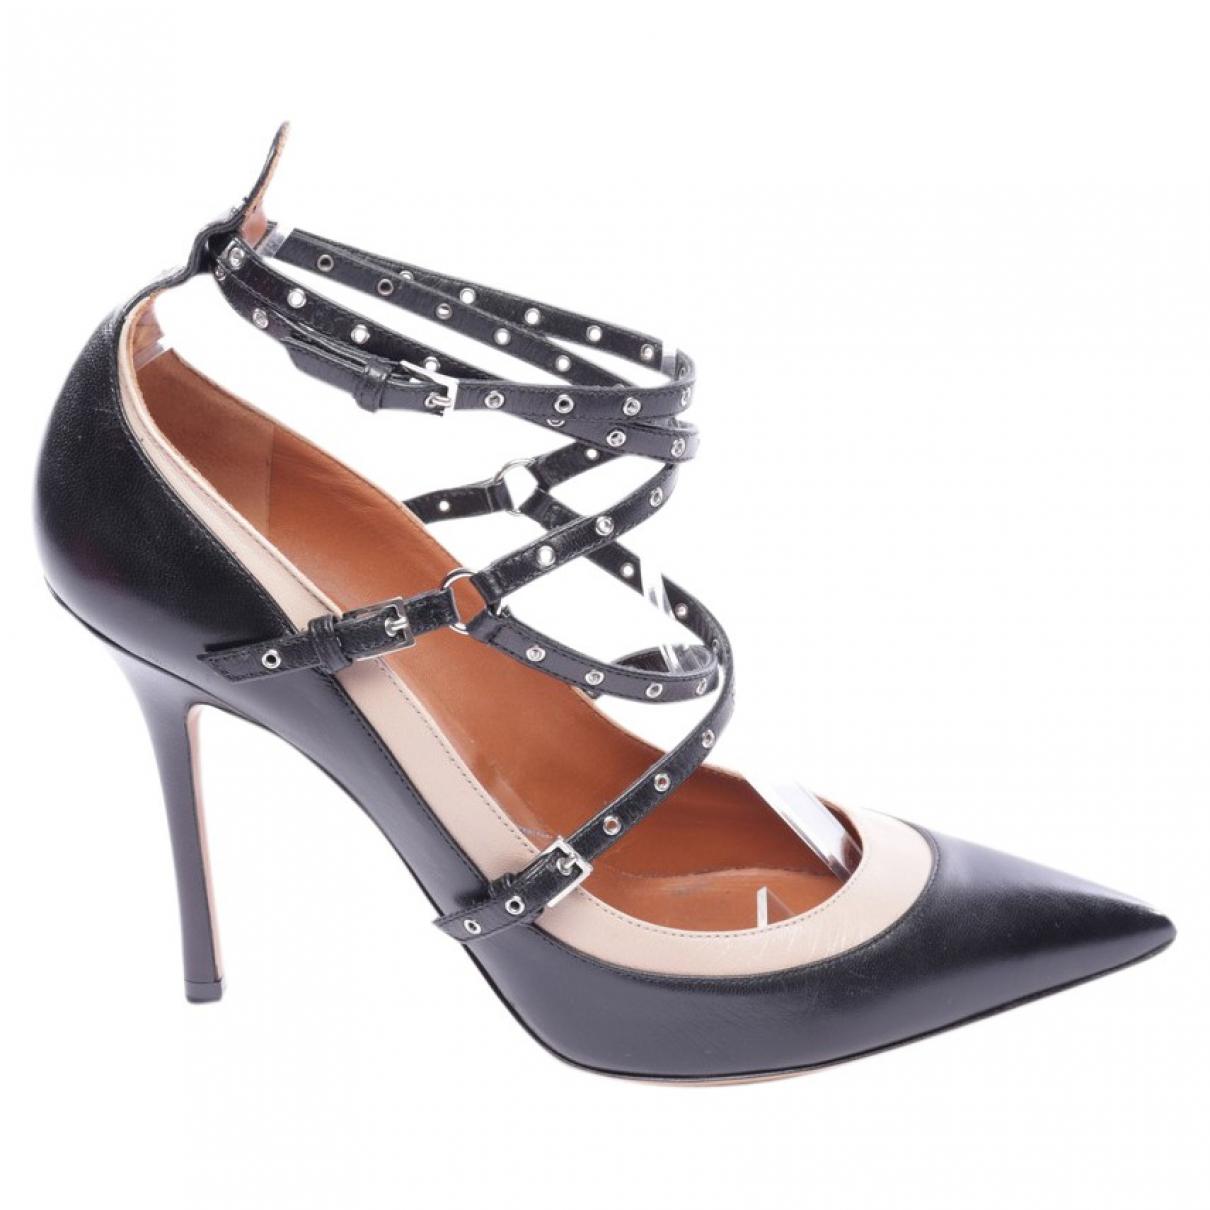 Valentino Garavani N Black Leather Heels for Women 40.5 EU